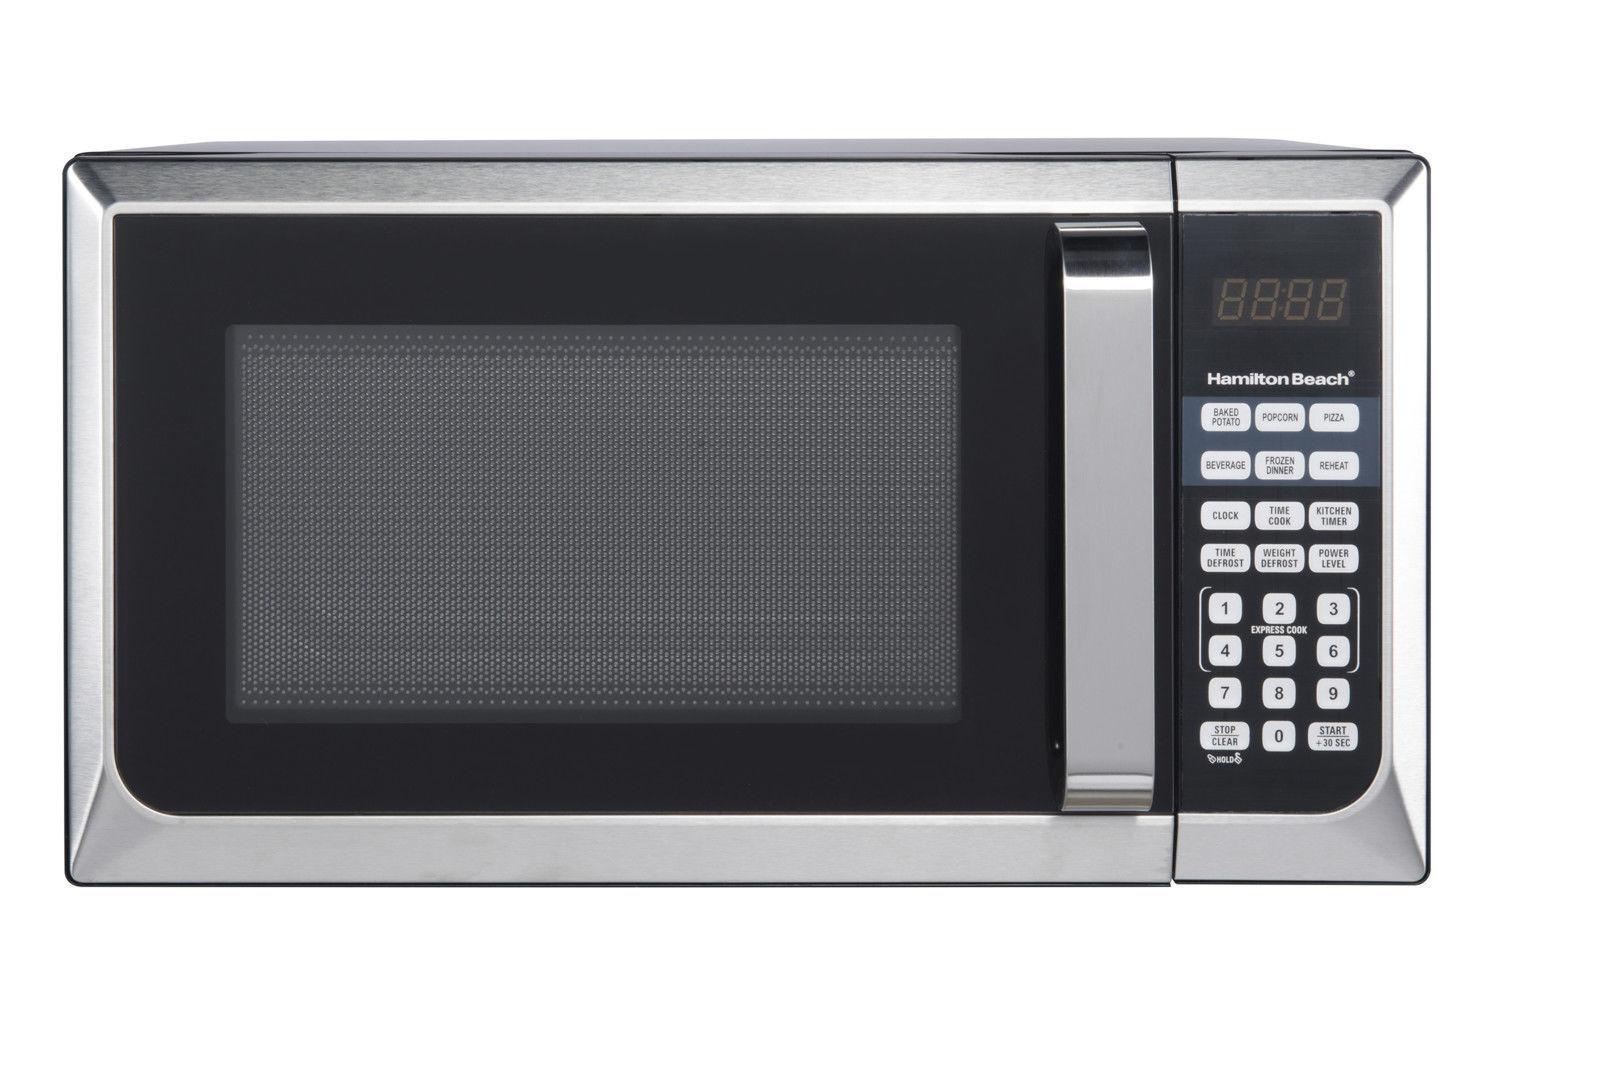 Hamilton Beach 0 9 Cu Ft Microwave Oven 900w Stainless Steel